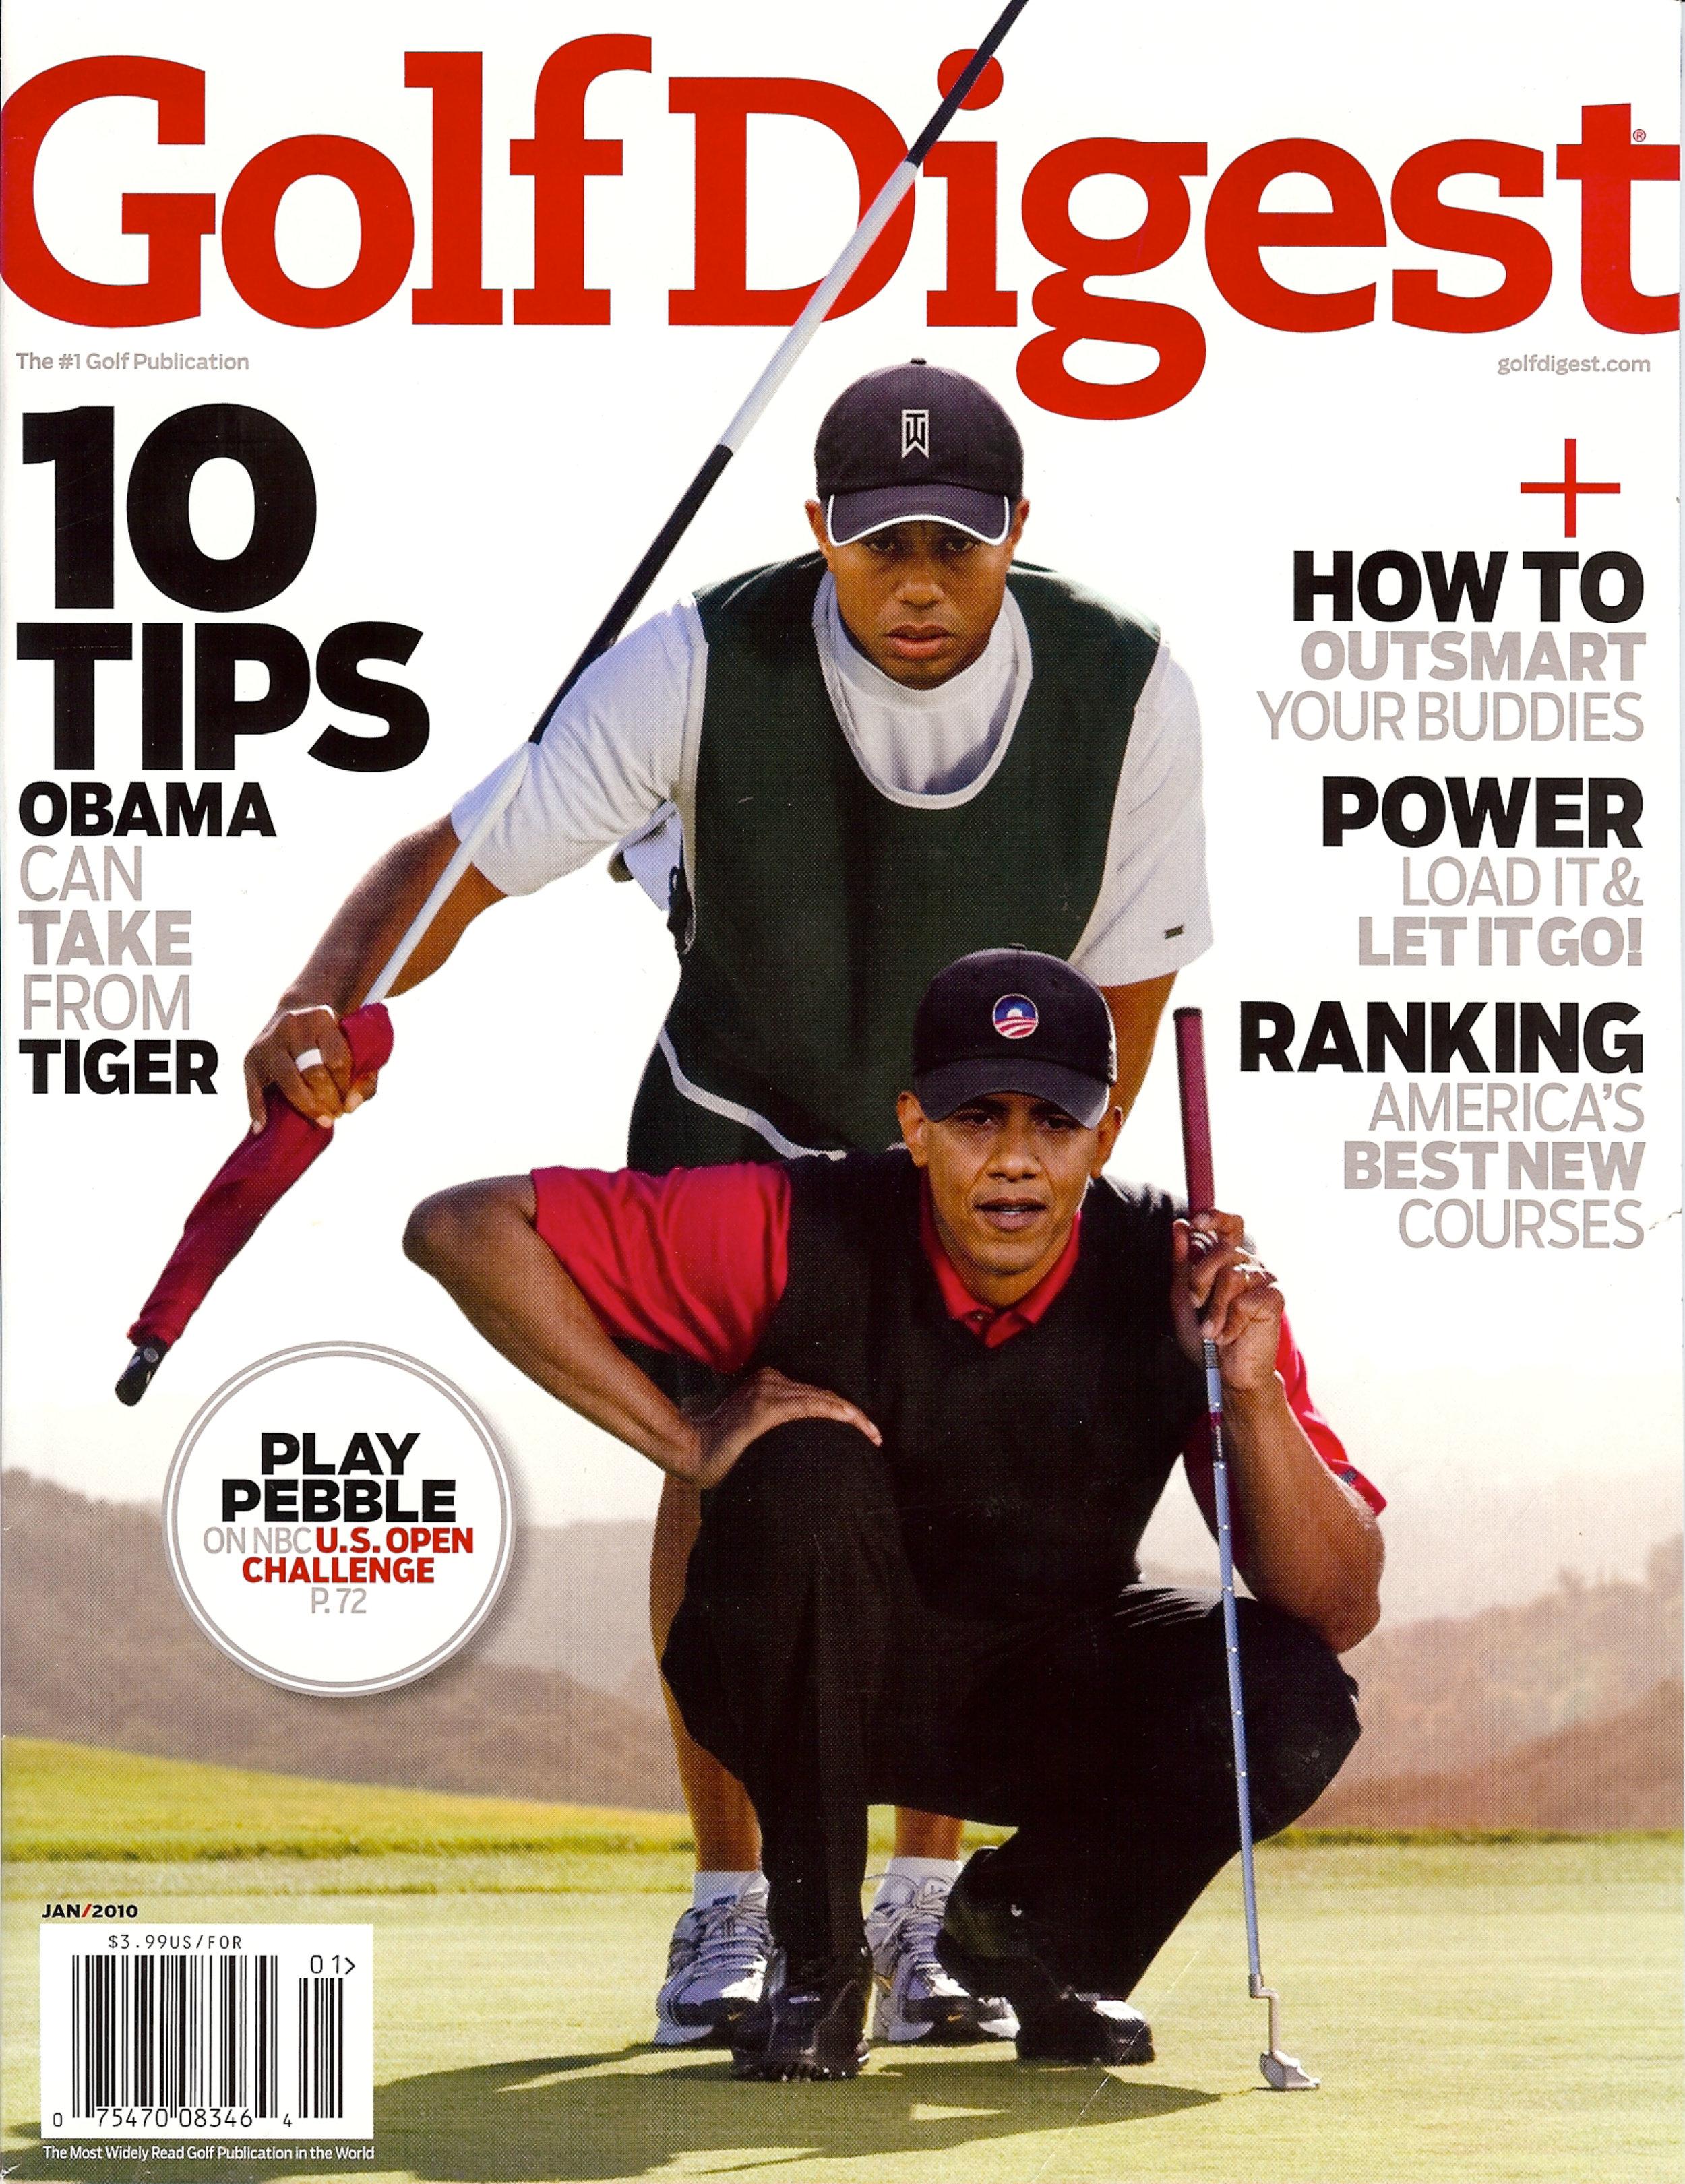 martis_Golf Digest 1.10.jpg